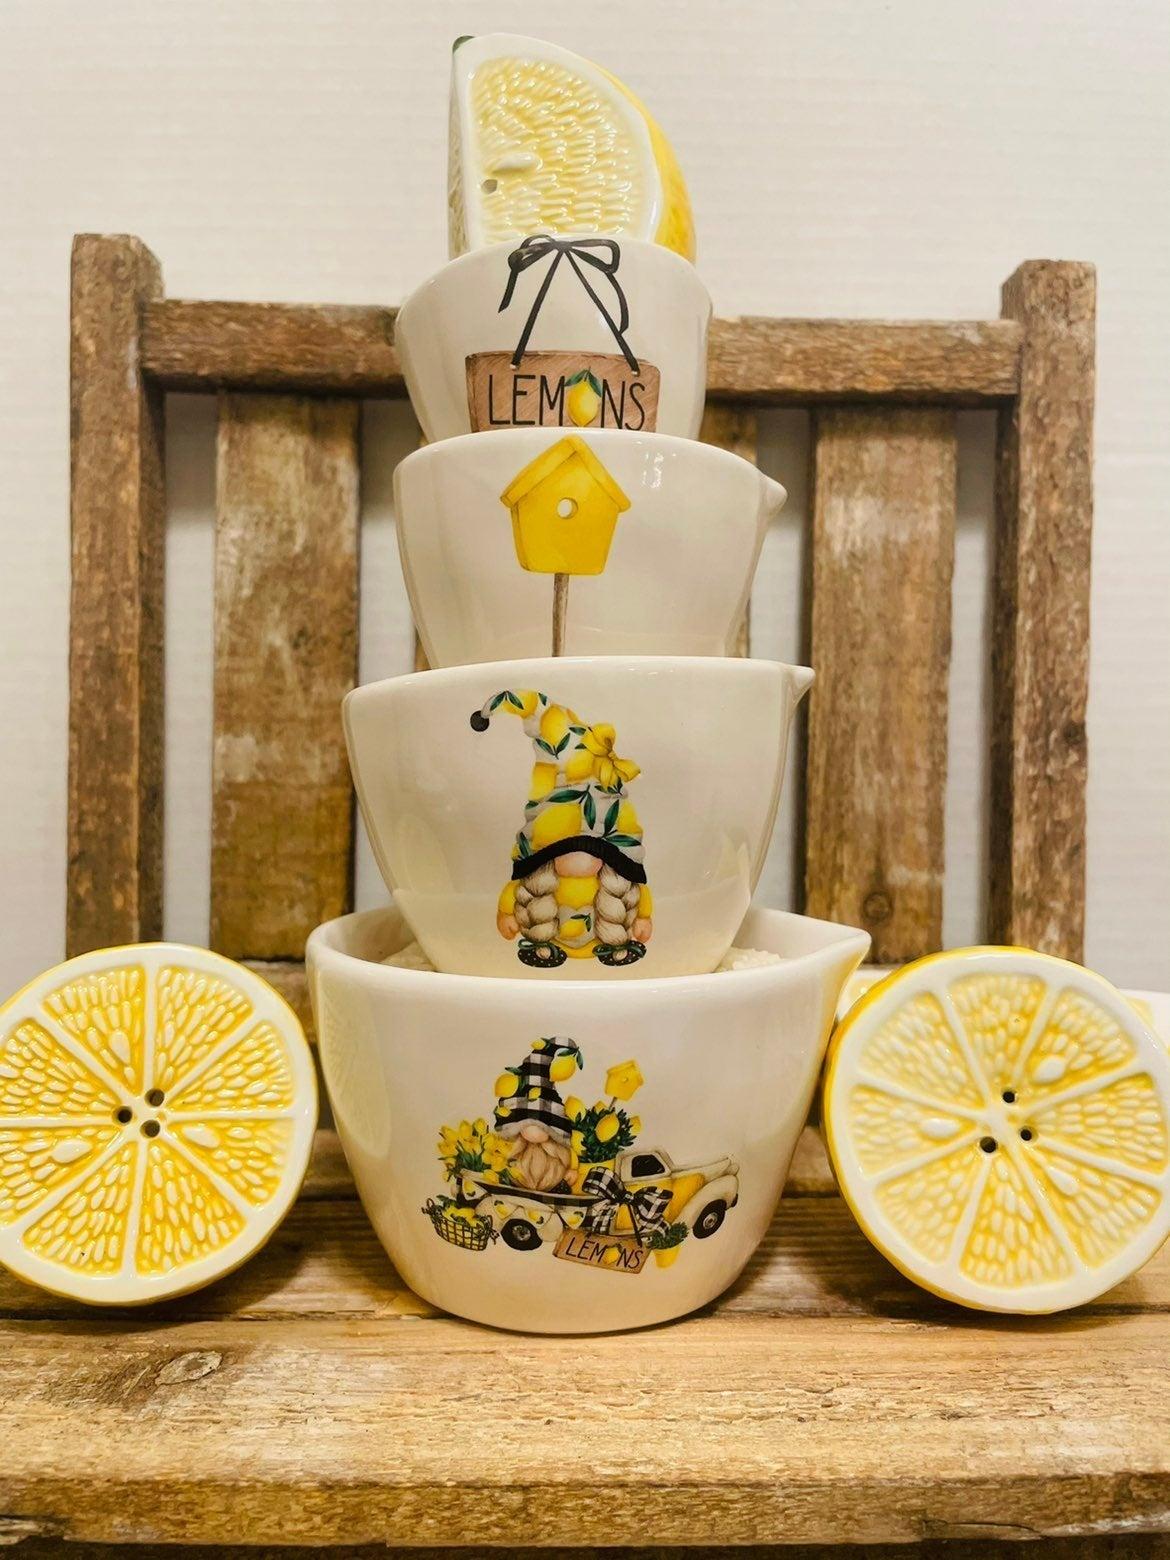 Lemon Truck Decals Set